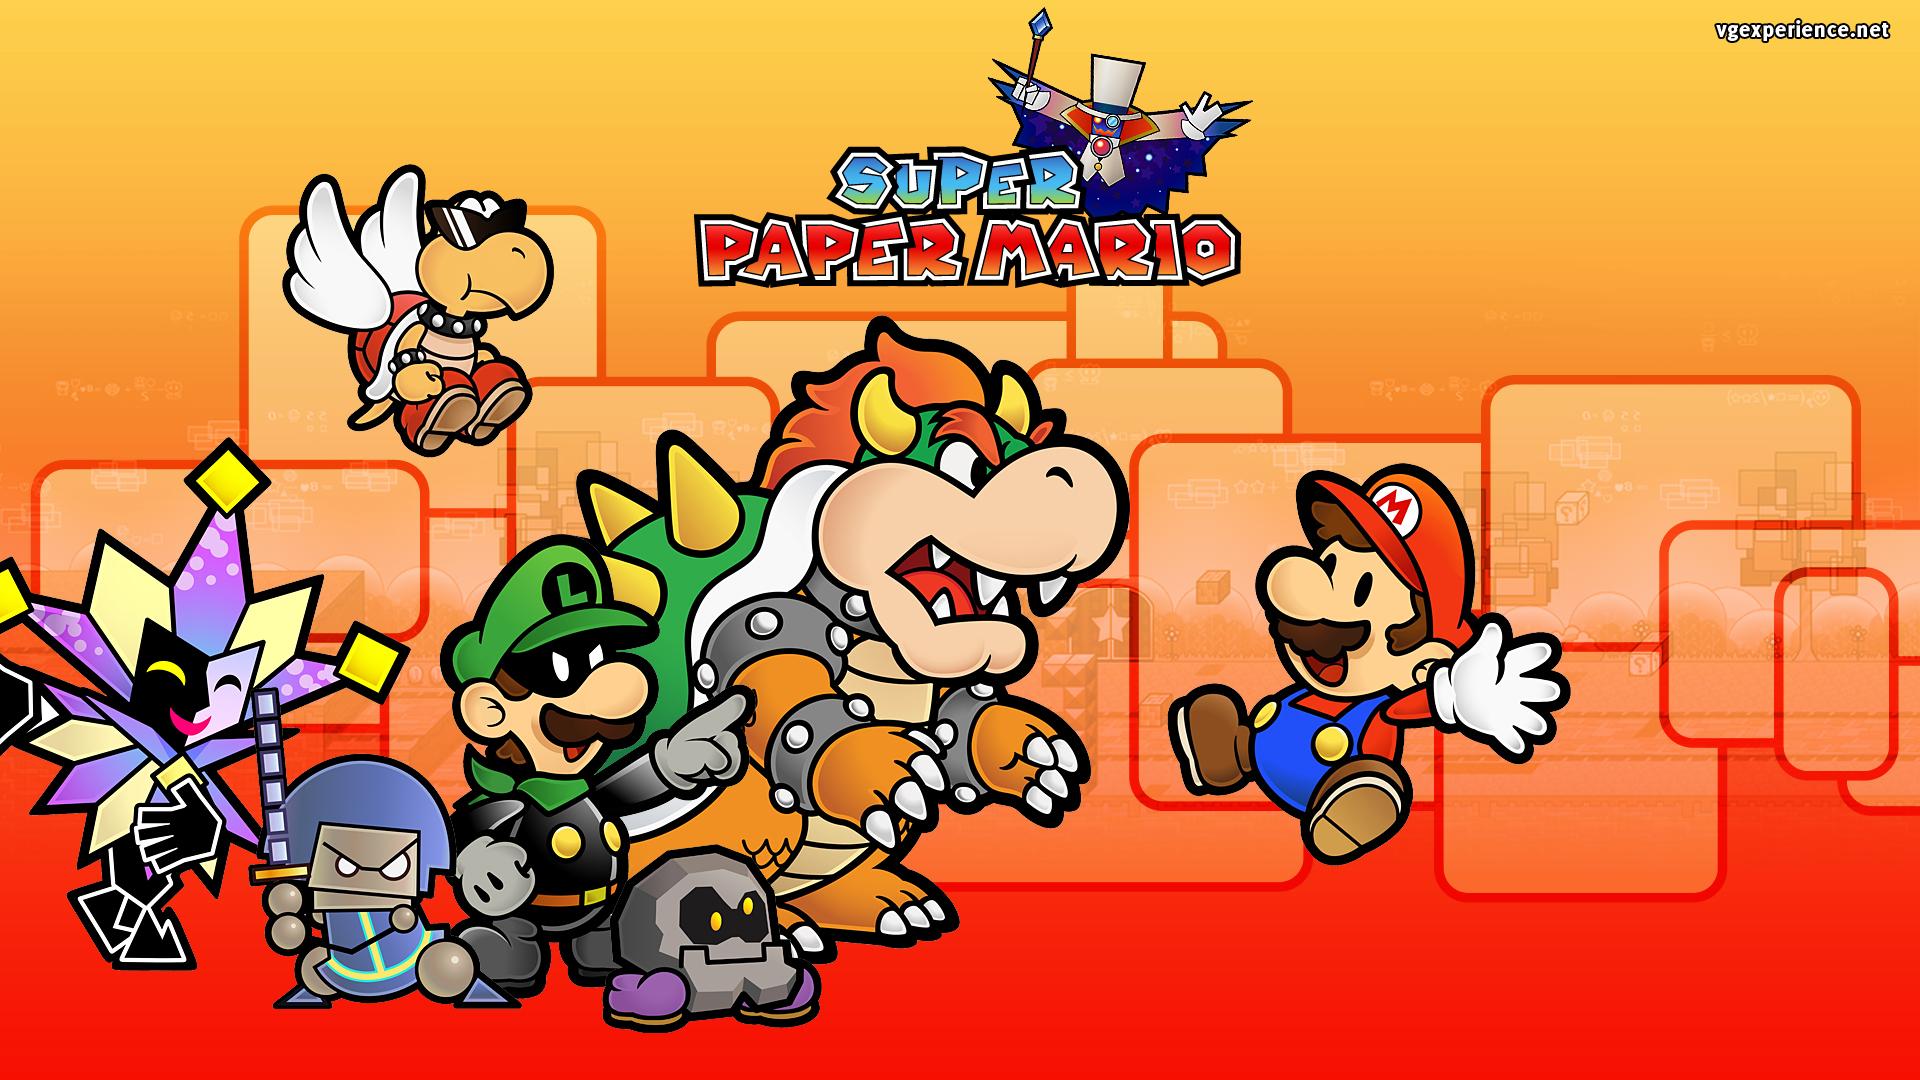 3d Wallpaper Maker Super Paper Mario Details Launchbox Games Database